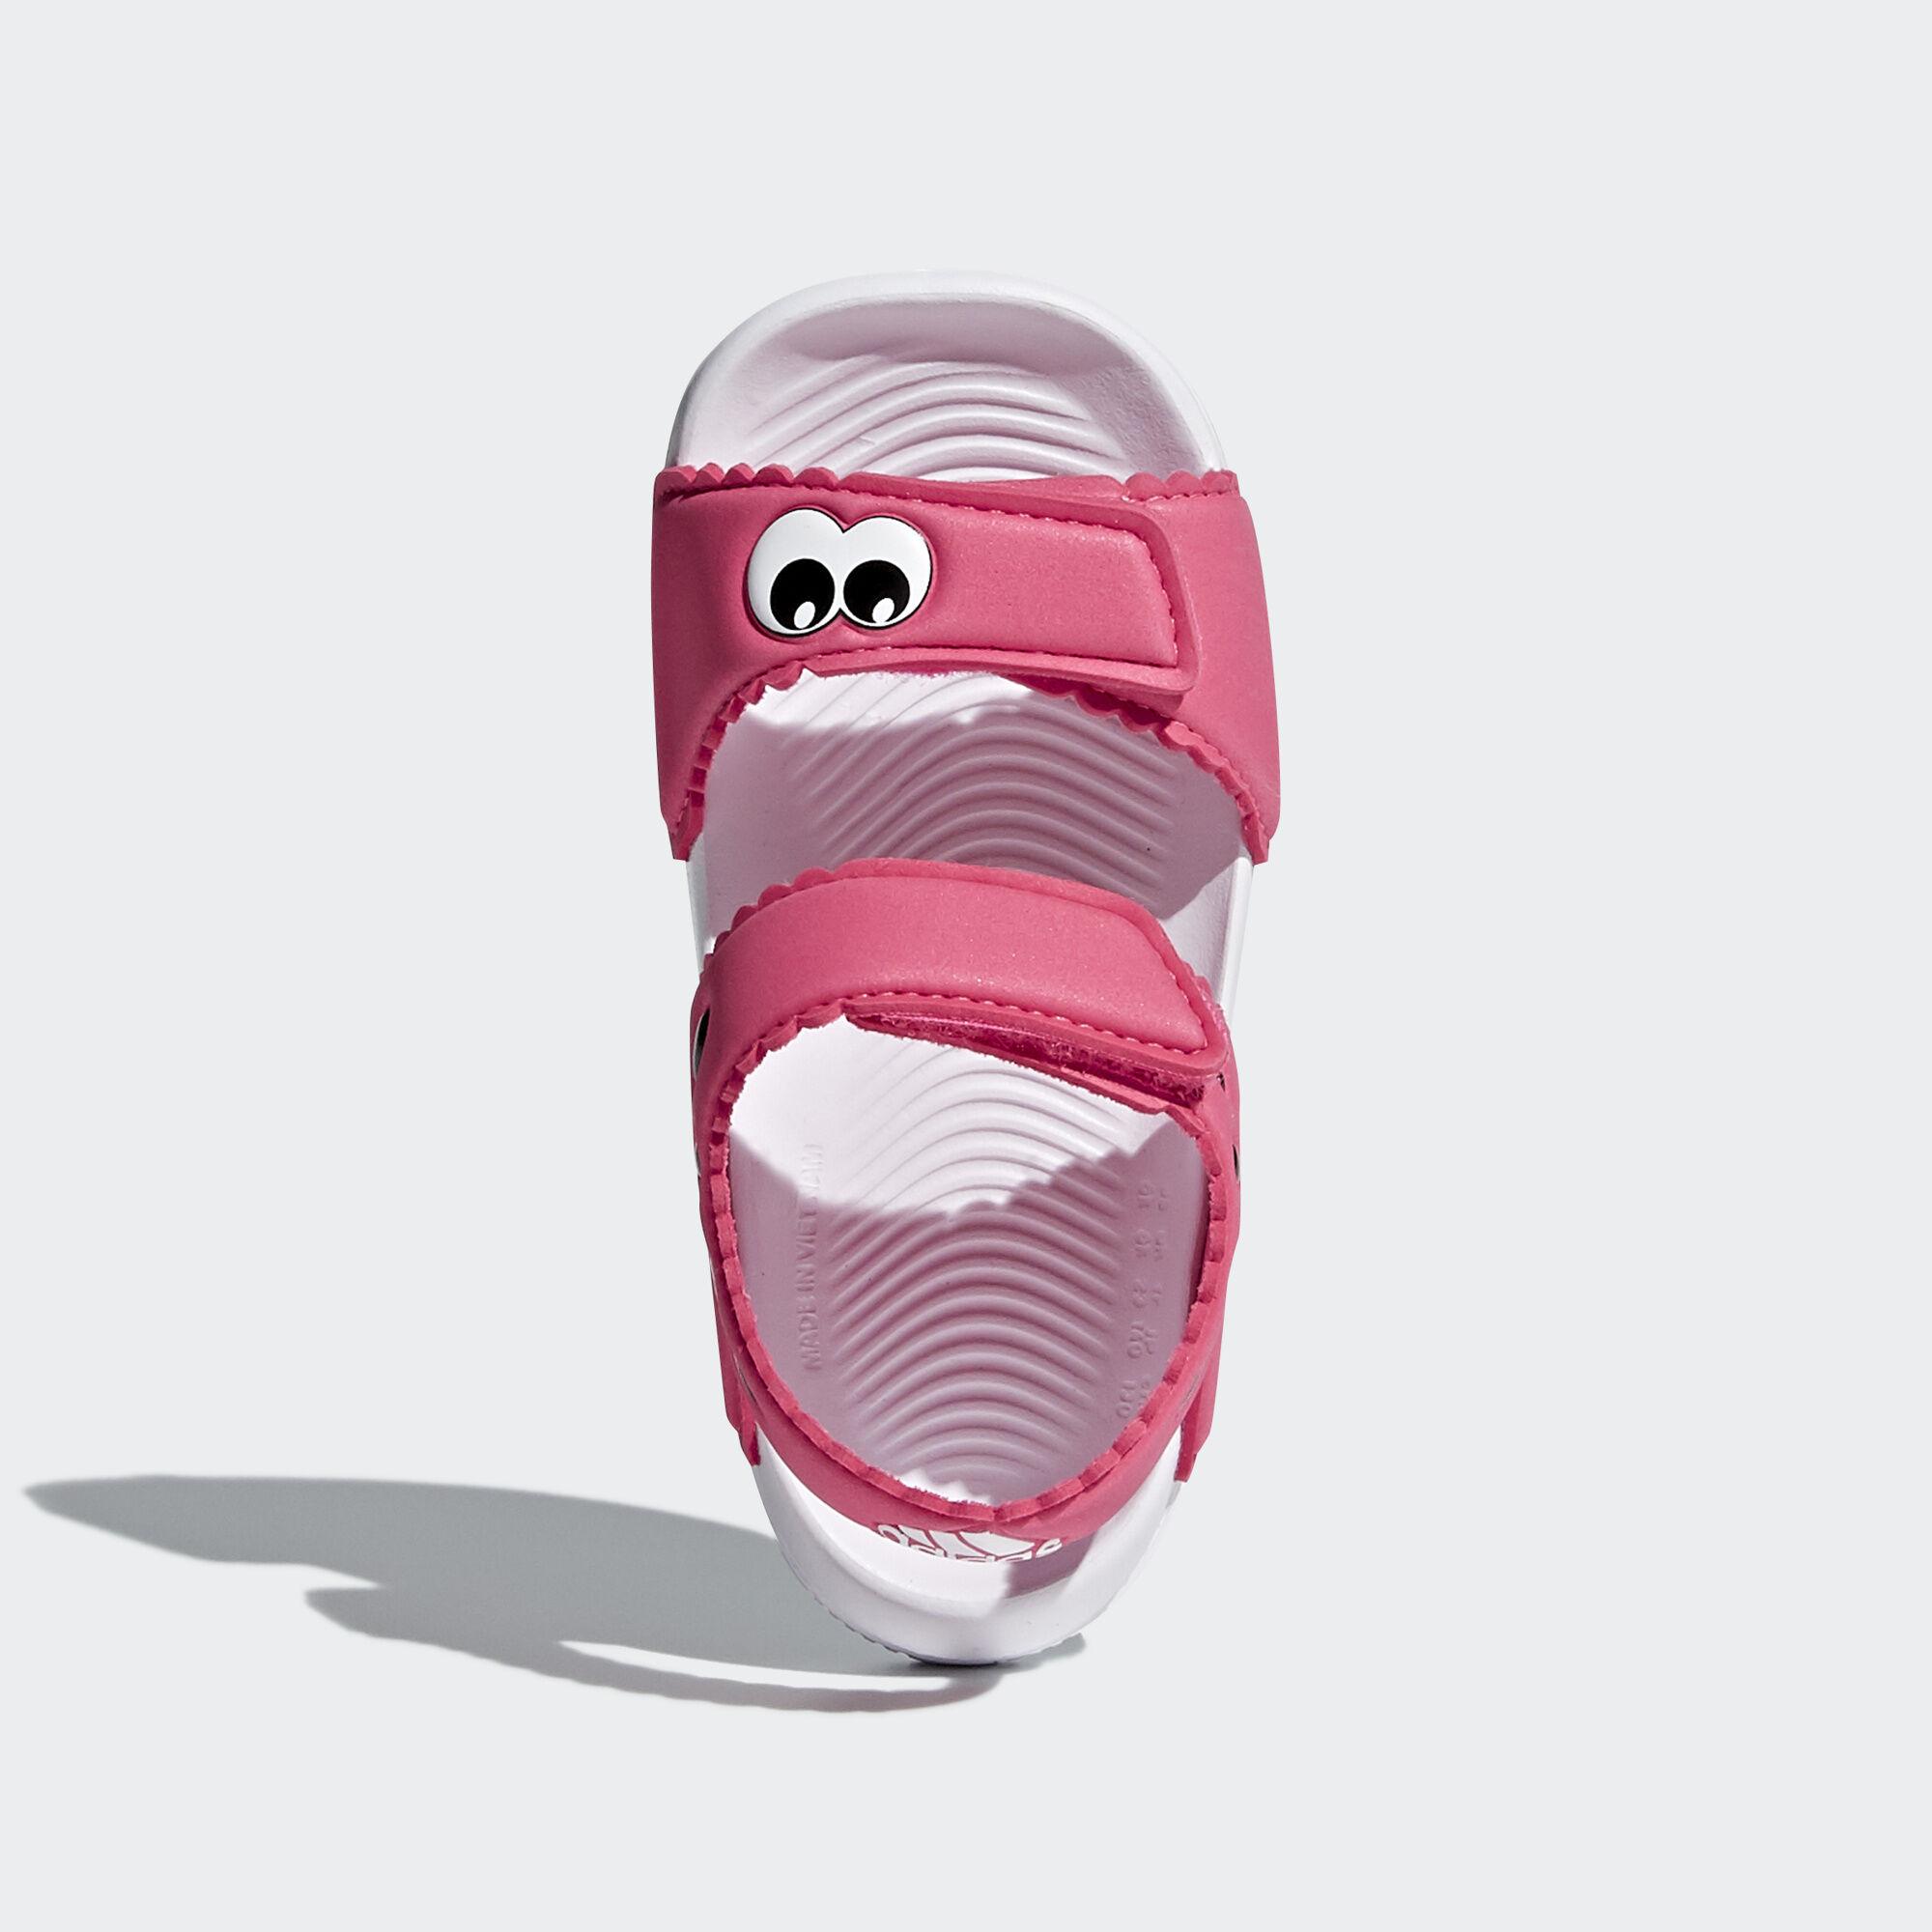 adidas AltaSwim Sandals - Pink | adidas Singapore